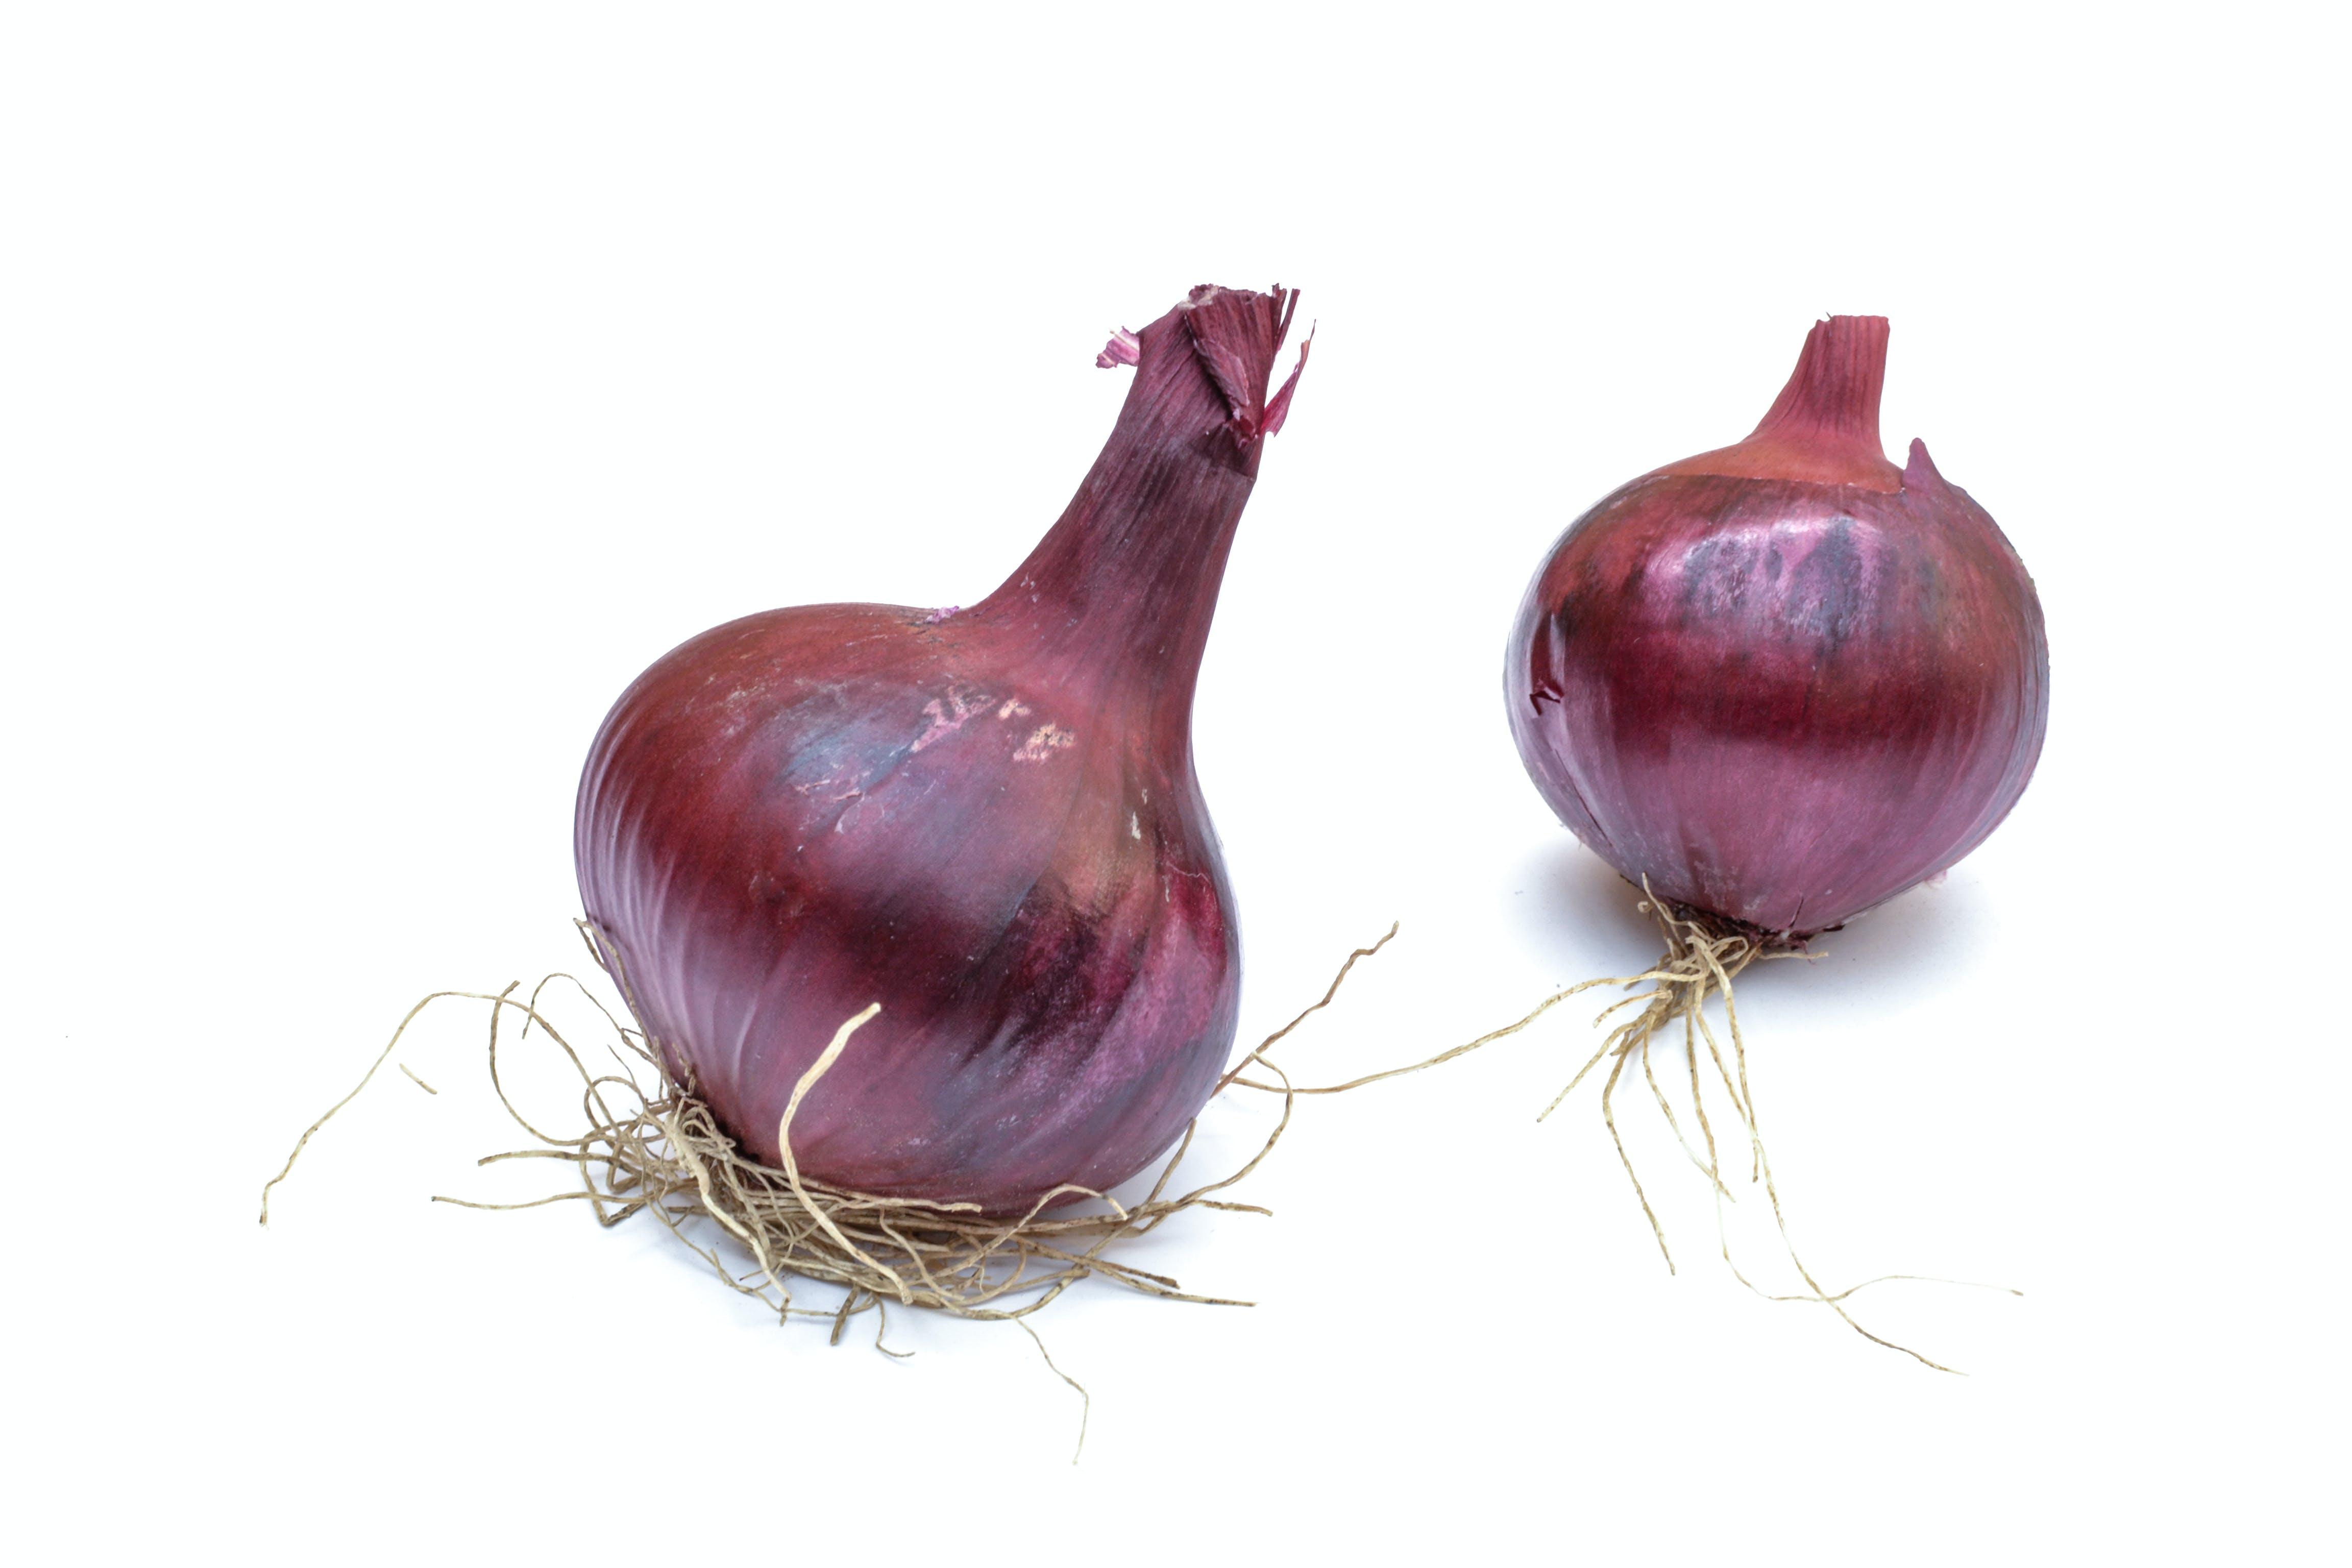 Free stock photo of onion, white background